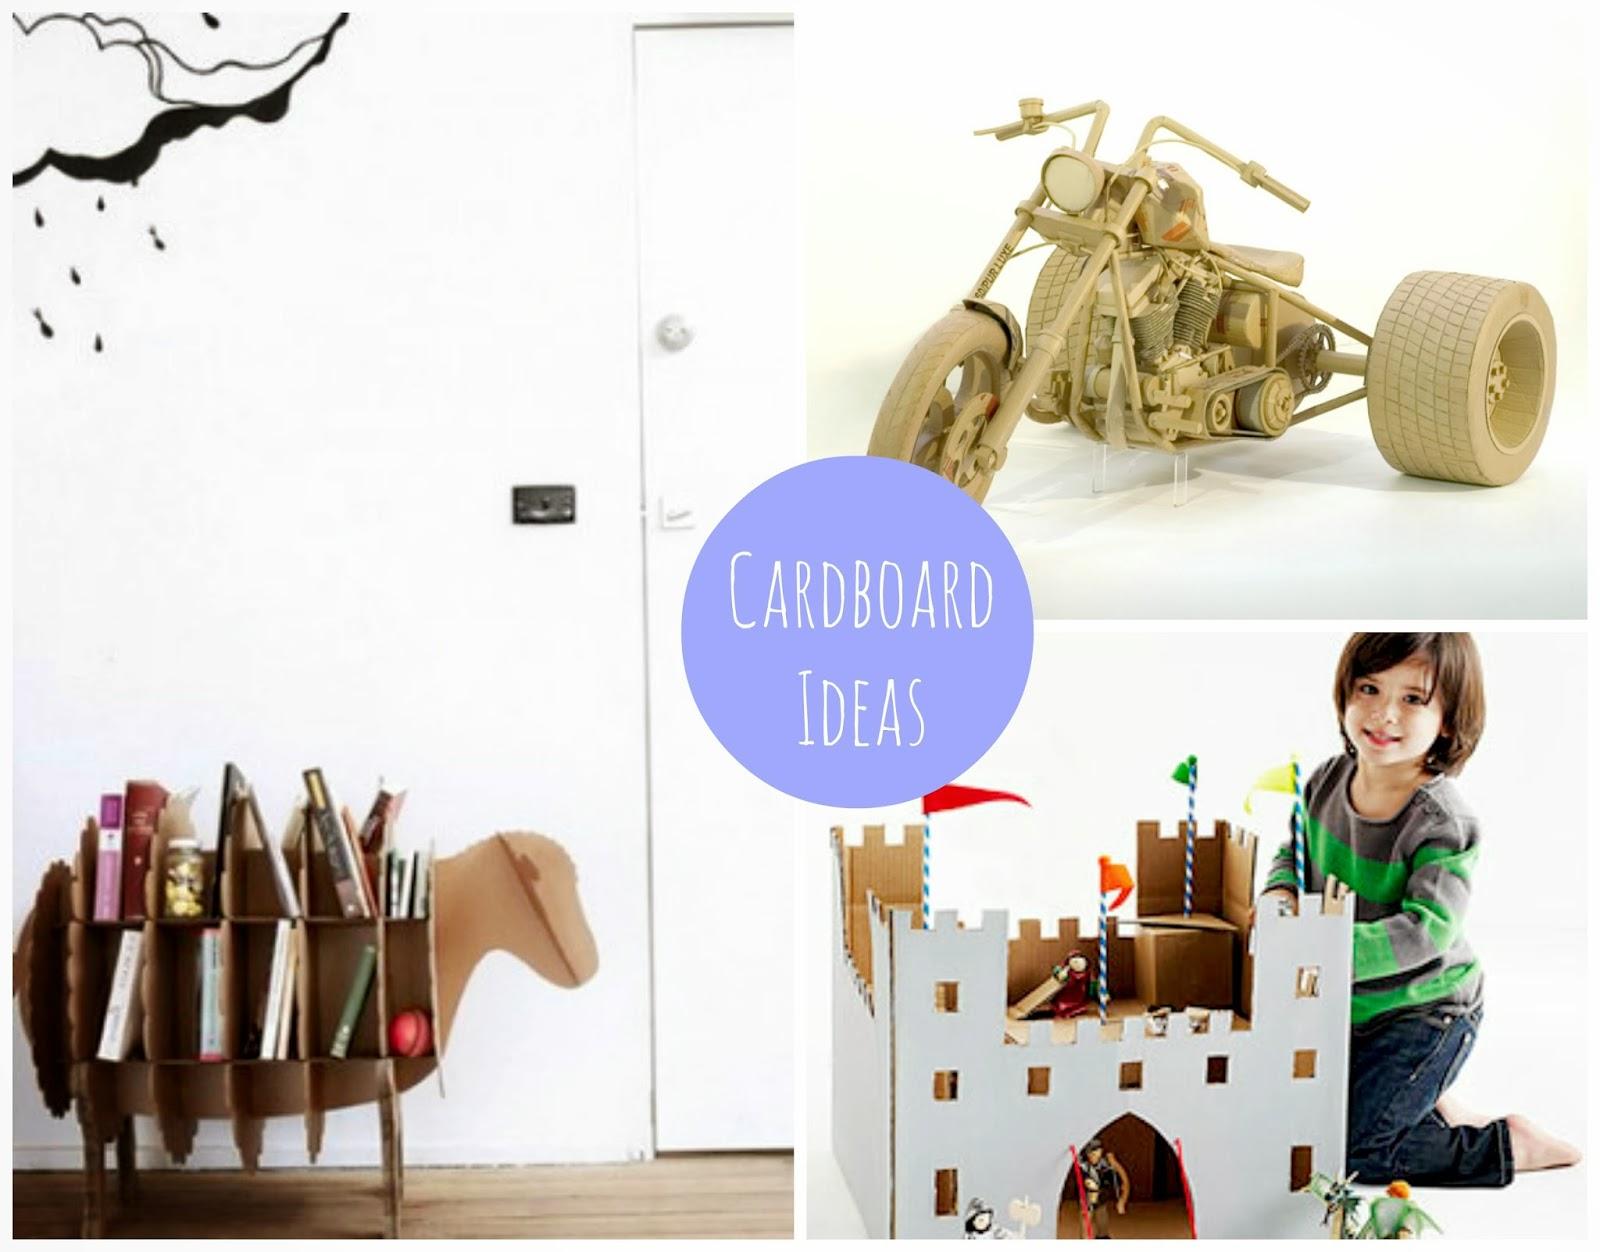 cardboard idea